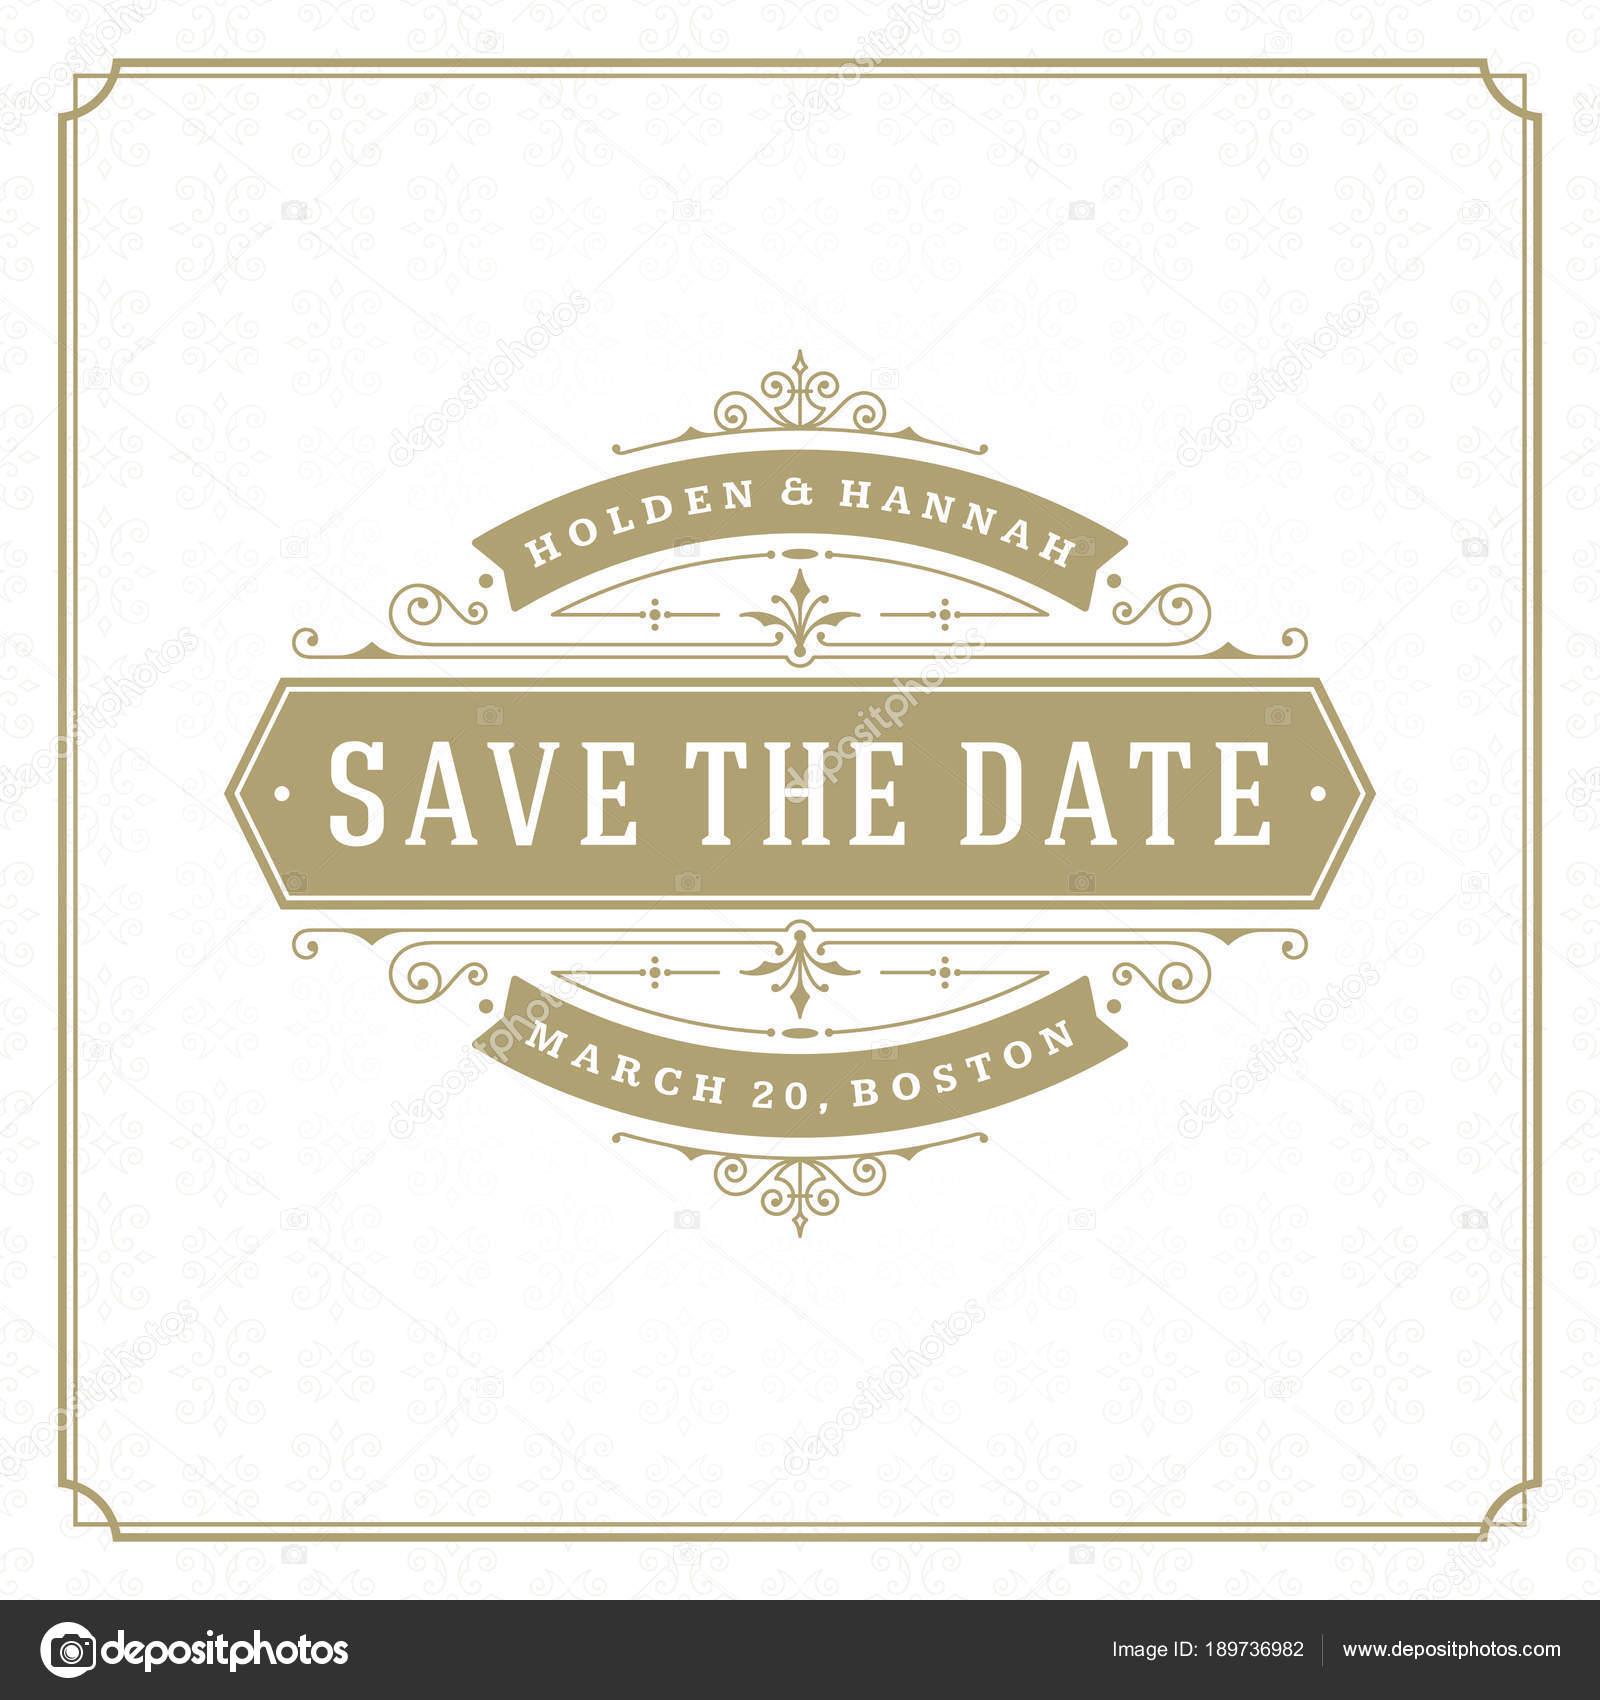 Wedding Date Invitation Card Vector Illustration Wedding Invite Title Vintage Stock Vector C Provectors 189736982